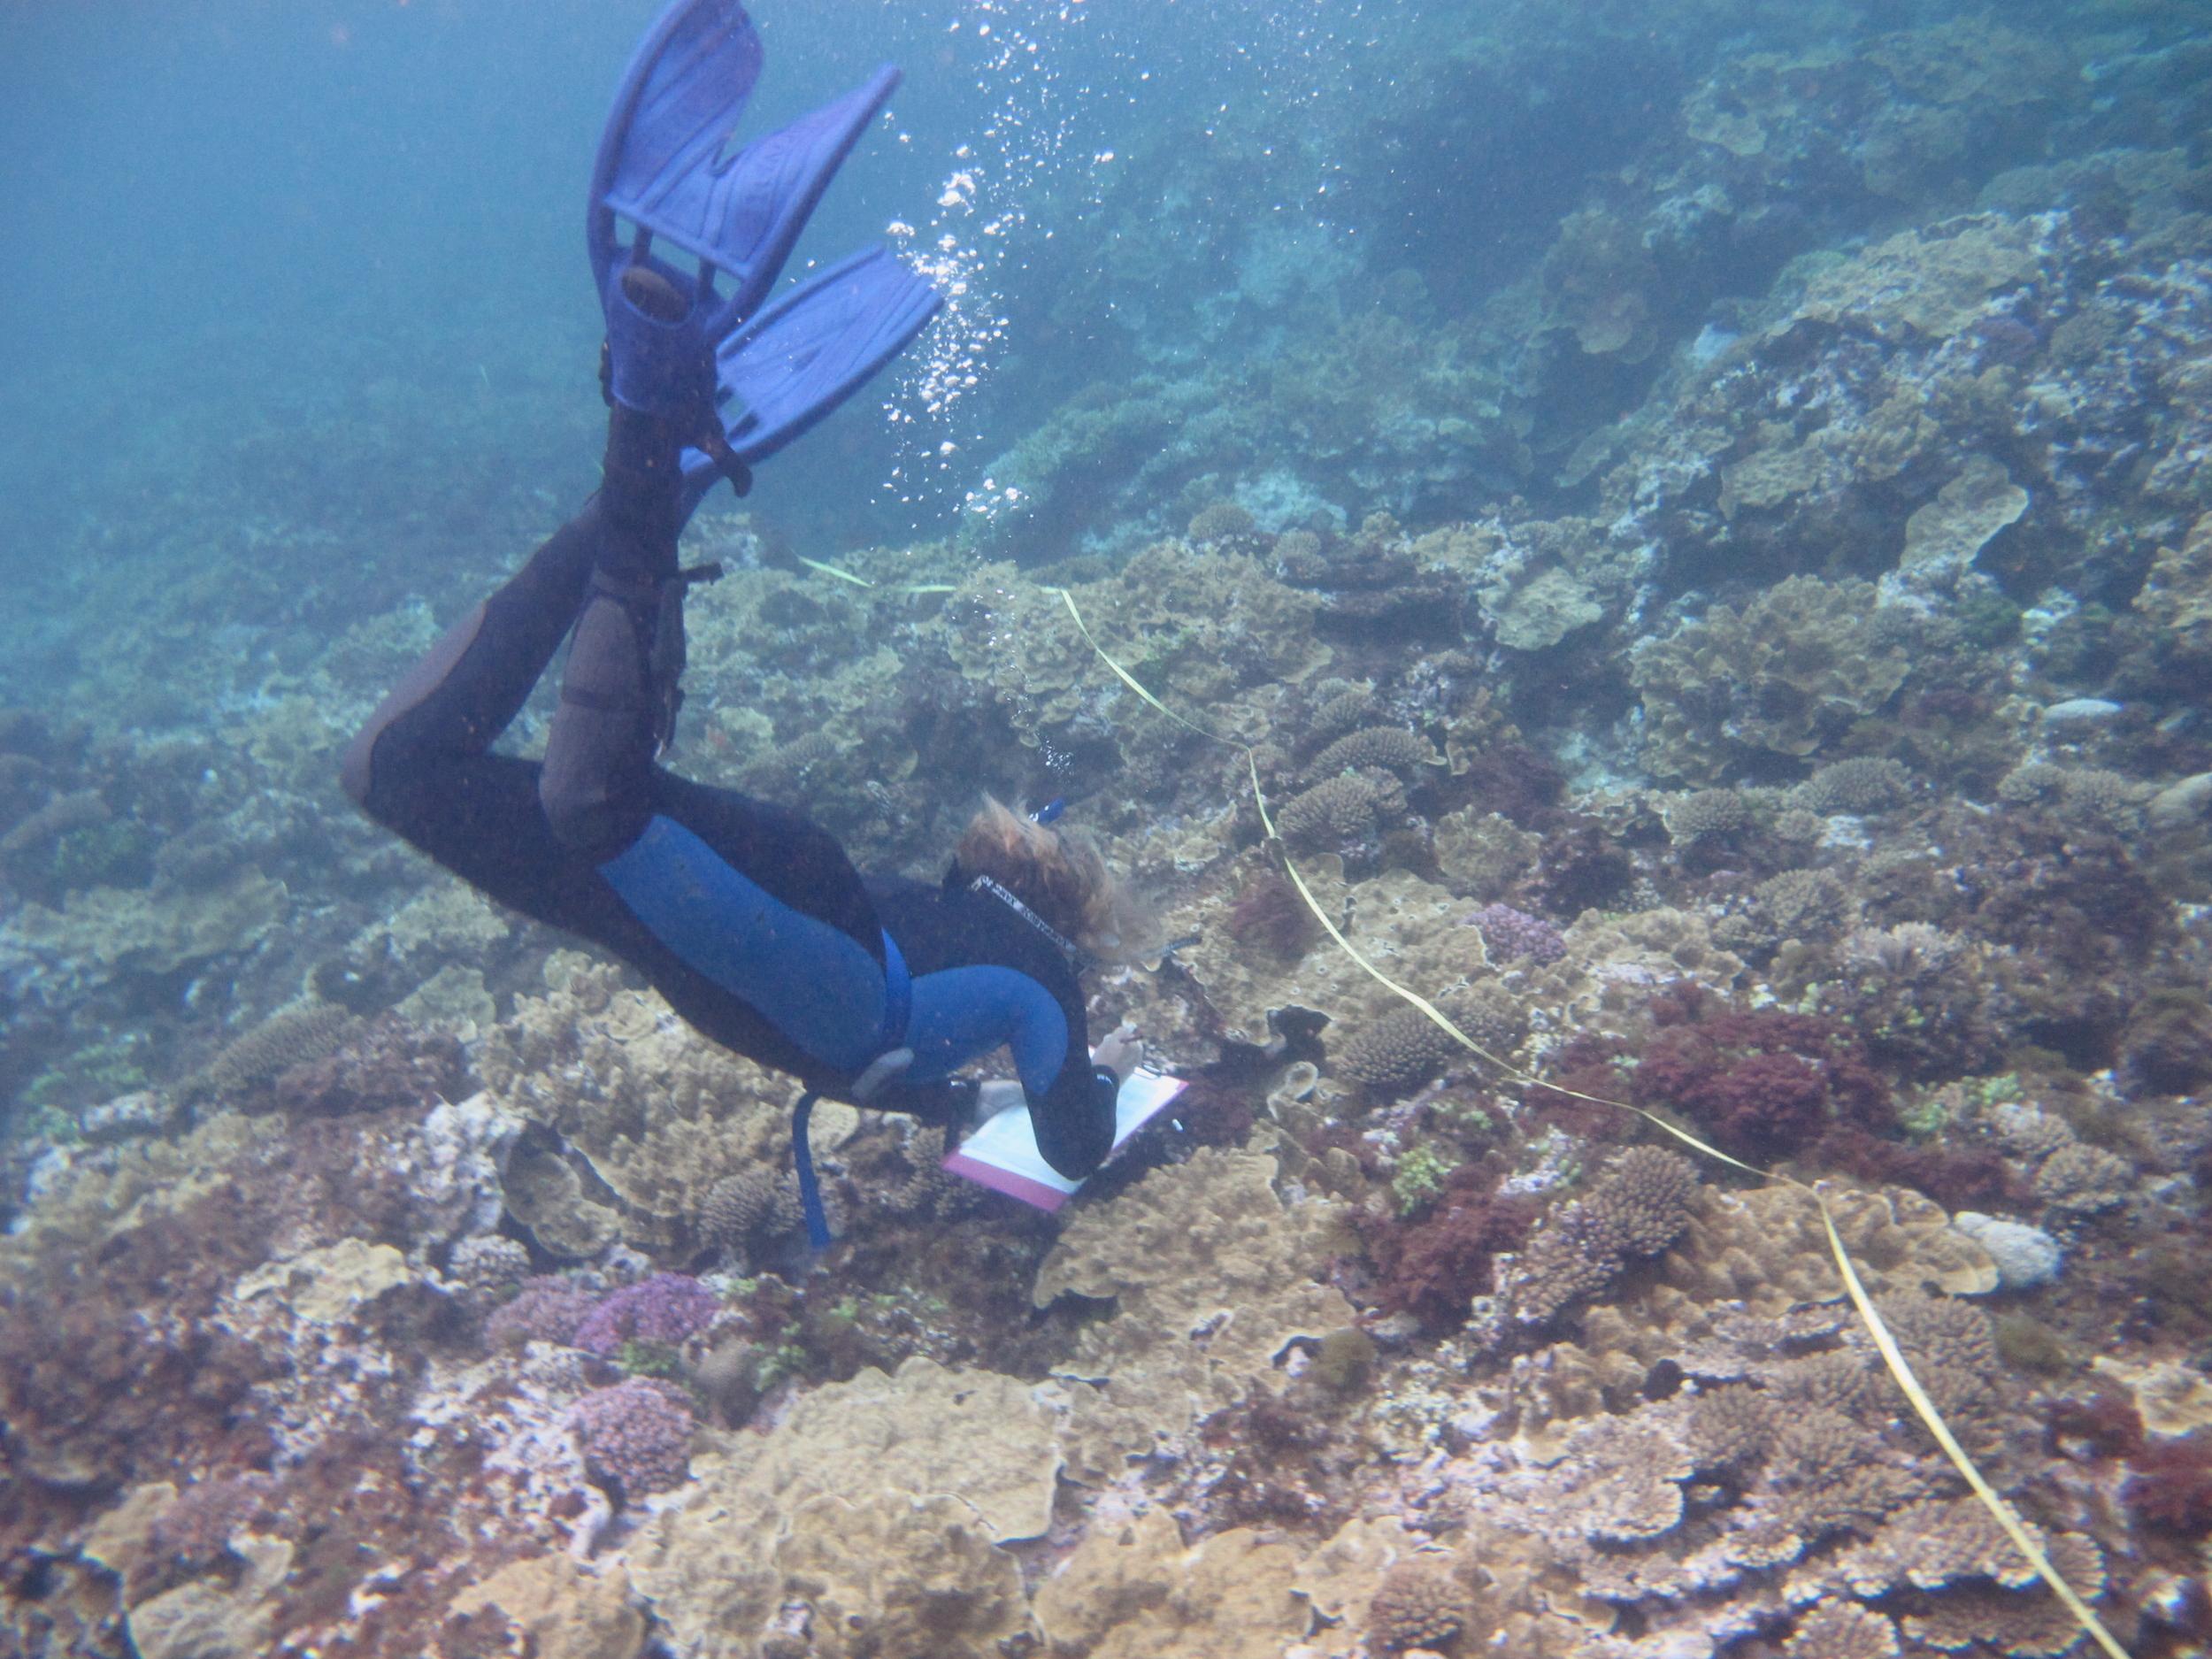 Conducting species abundance surveys at Lord Howe Island